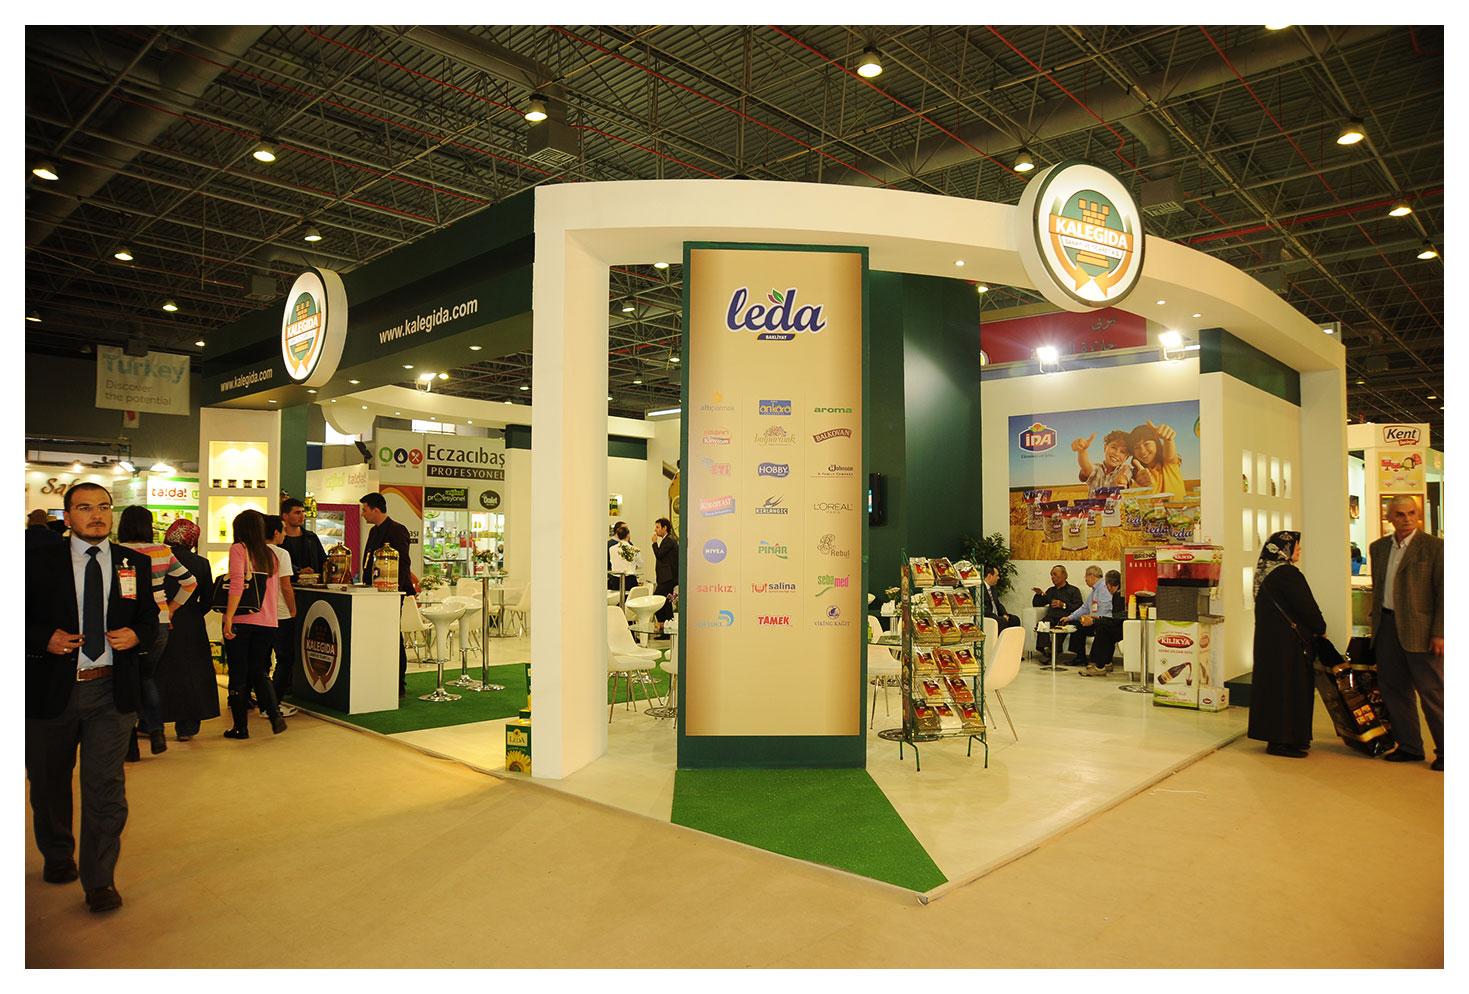 Kale Gida Exhibition Stand Design Photo by GriofisMimarlik